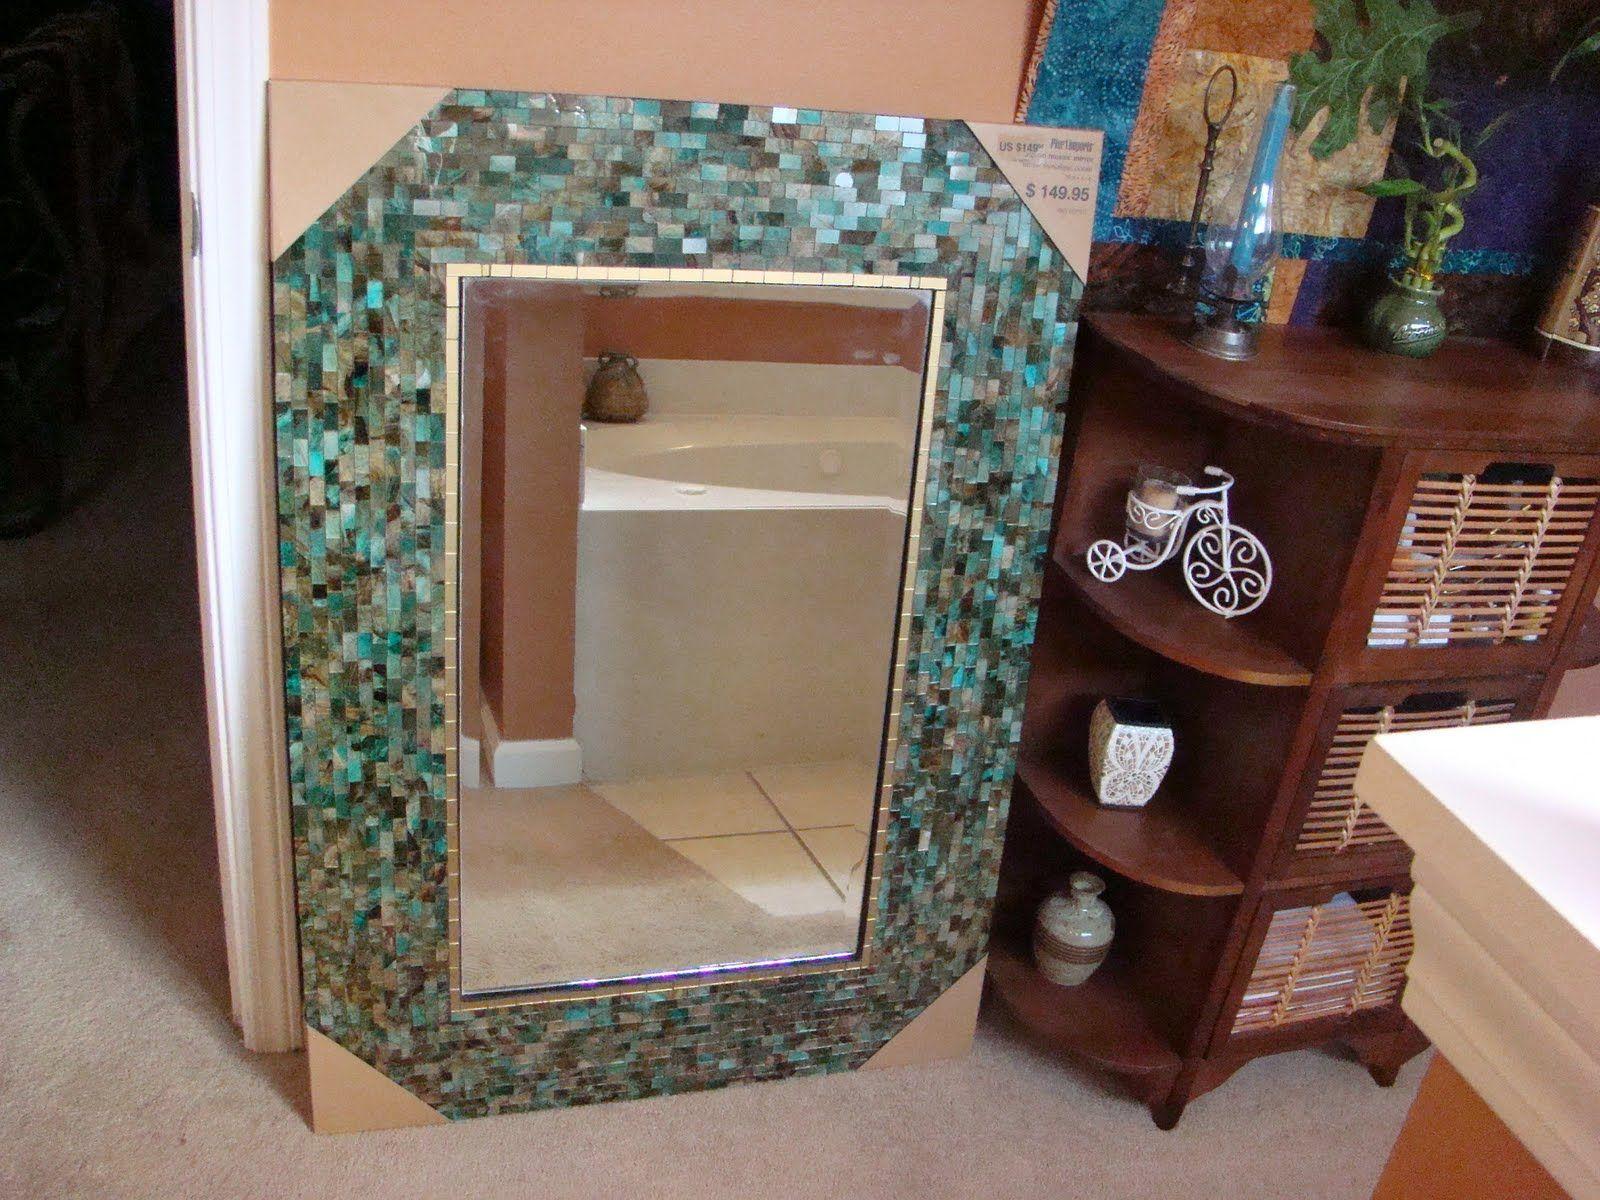 Ocean Mosaic Mirror Pier 1 | Tile crafts, Mirror tiles